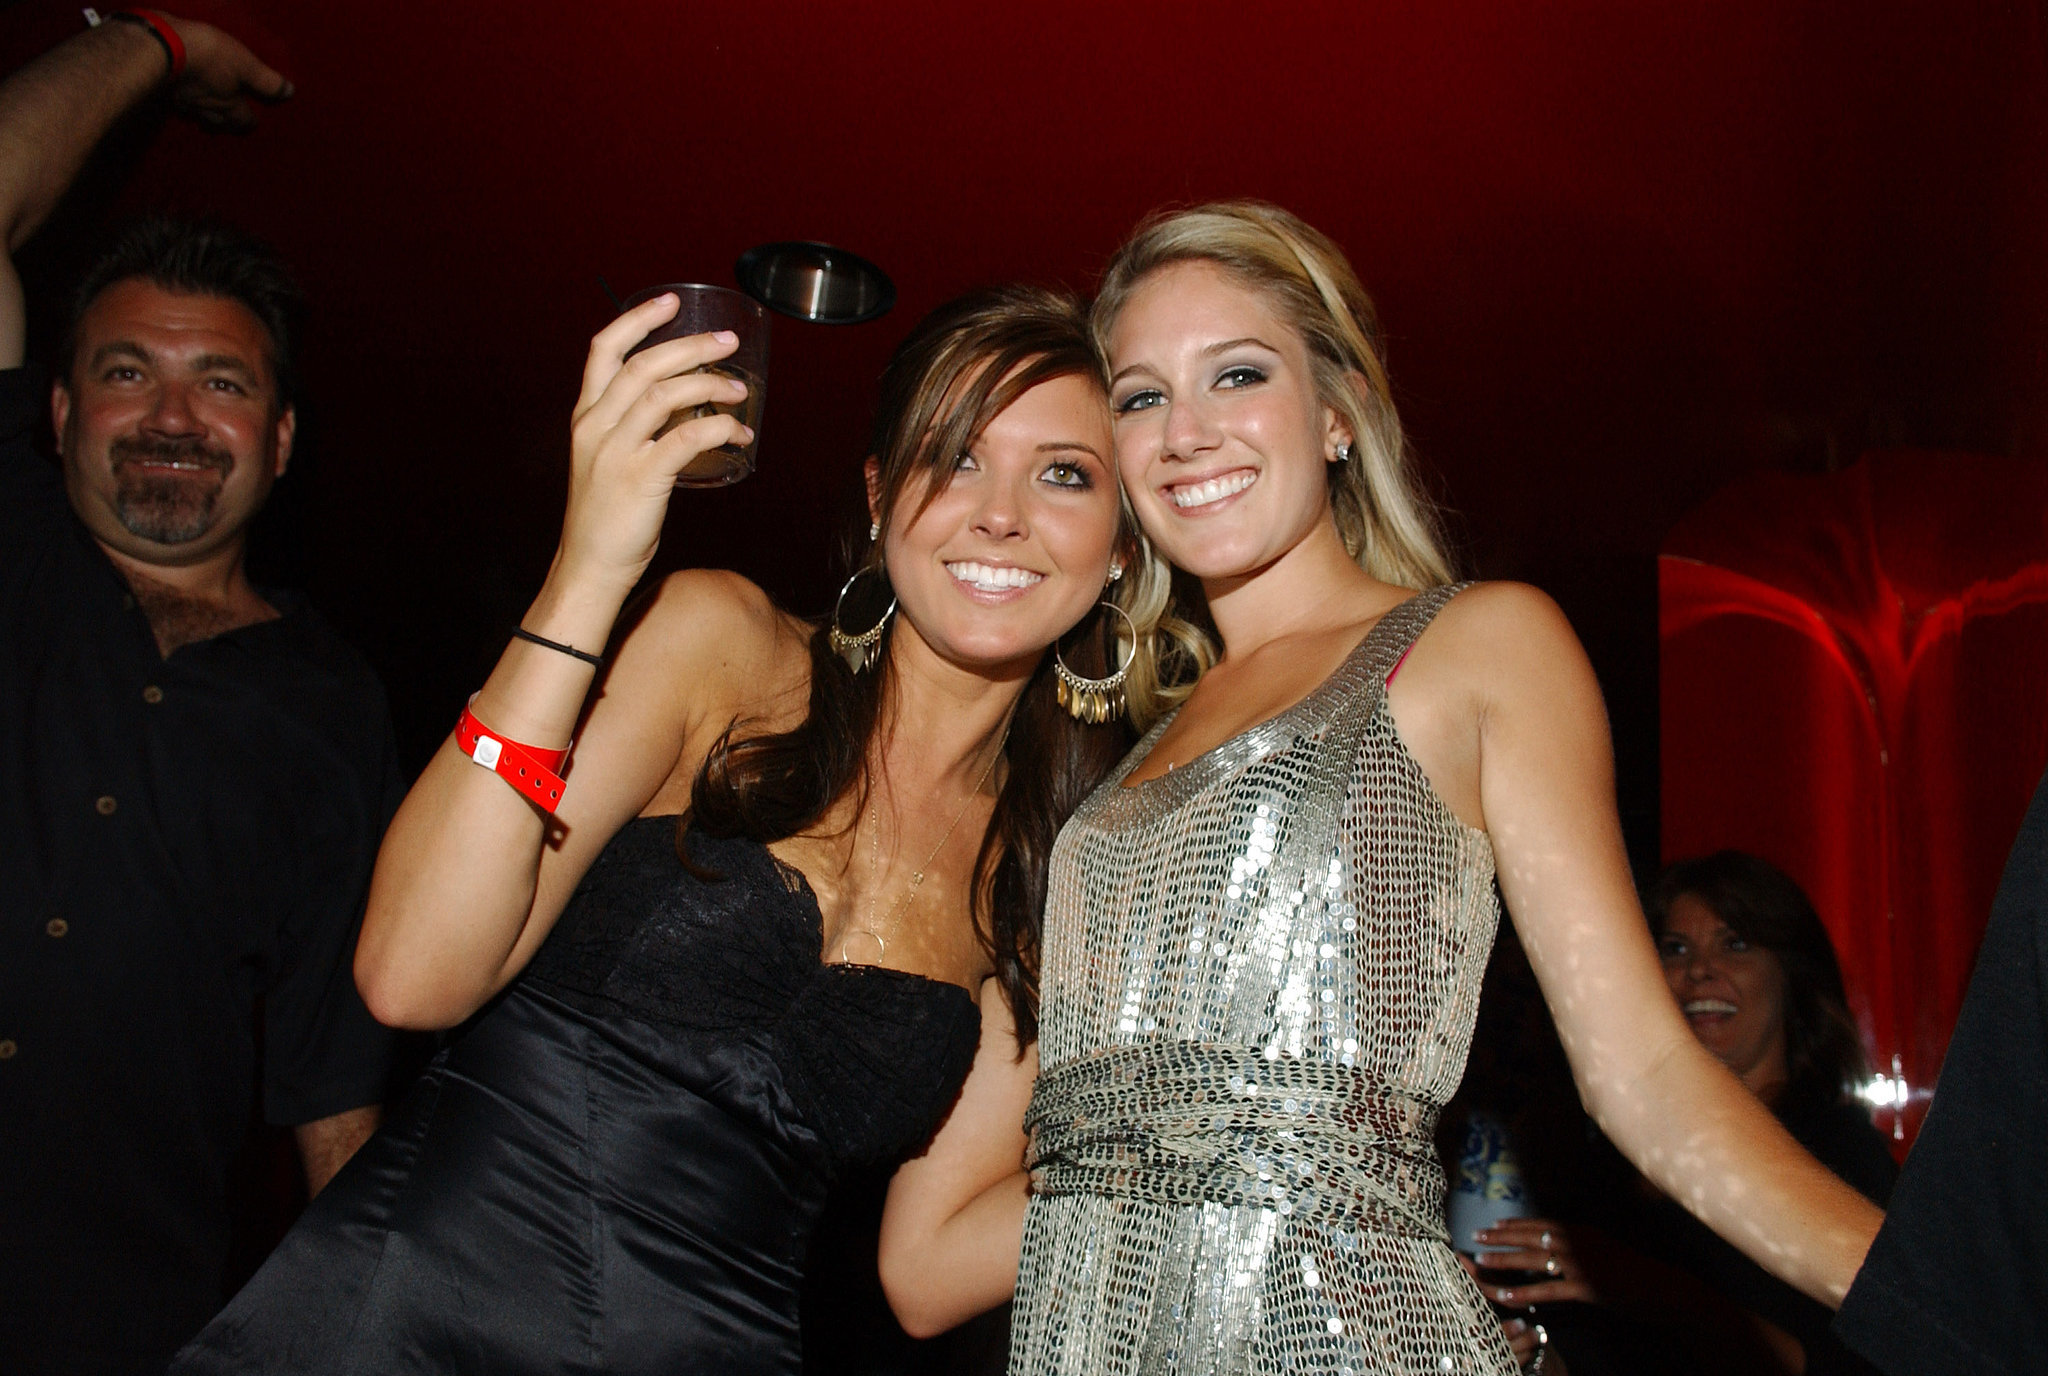 Audrina Patridge and Heidi Montag